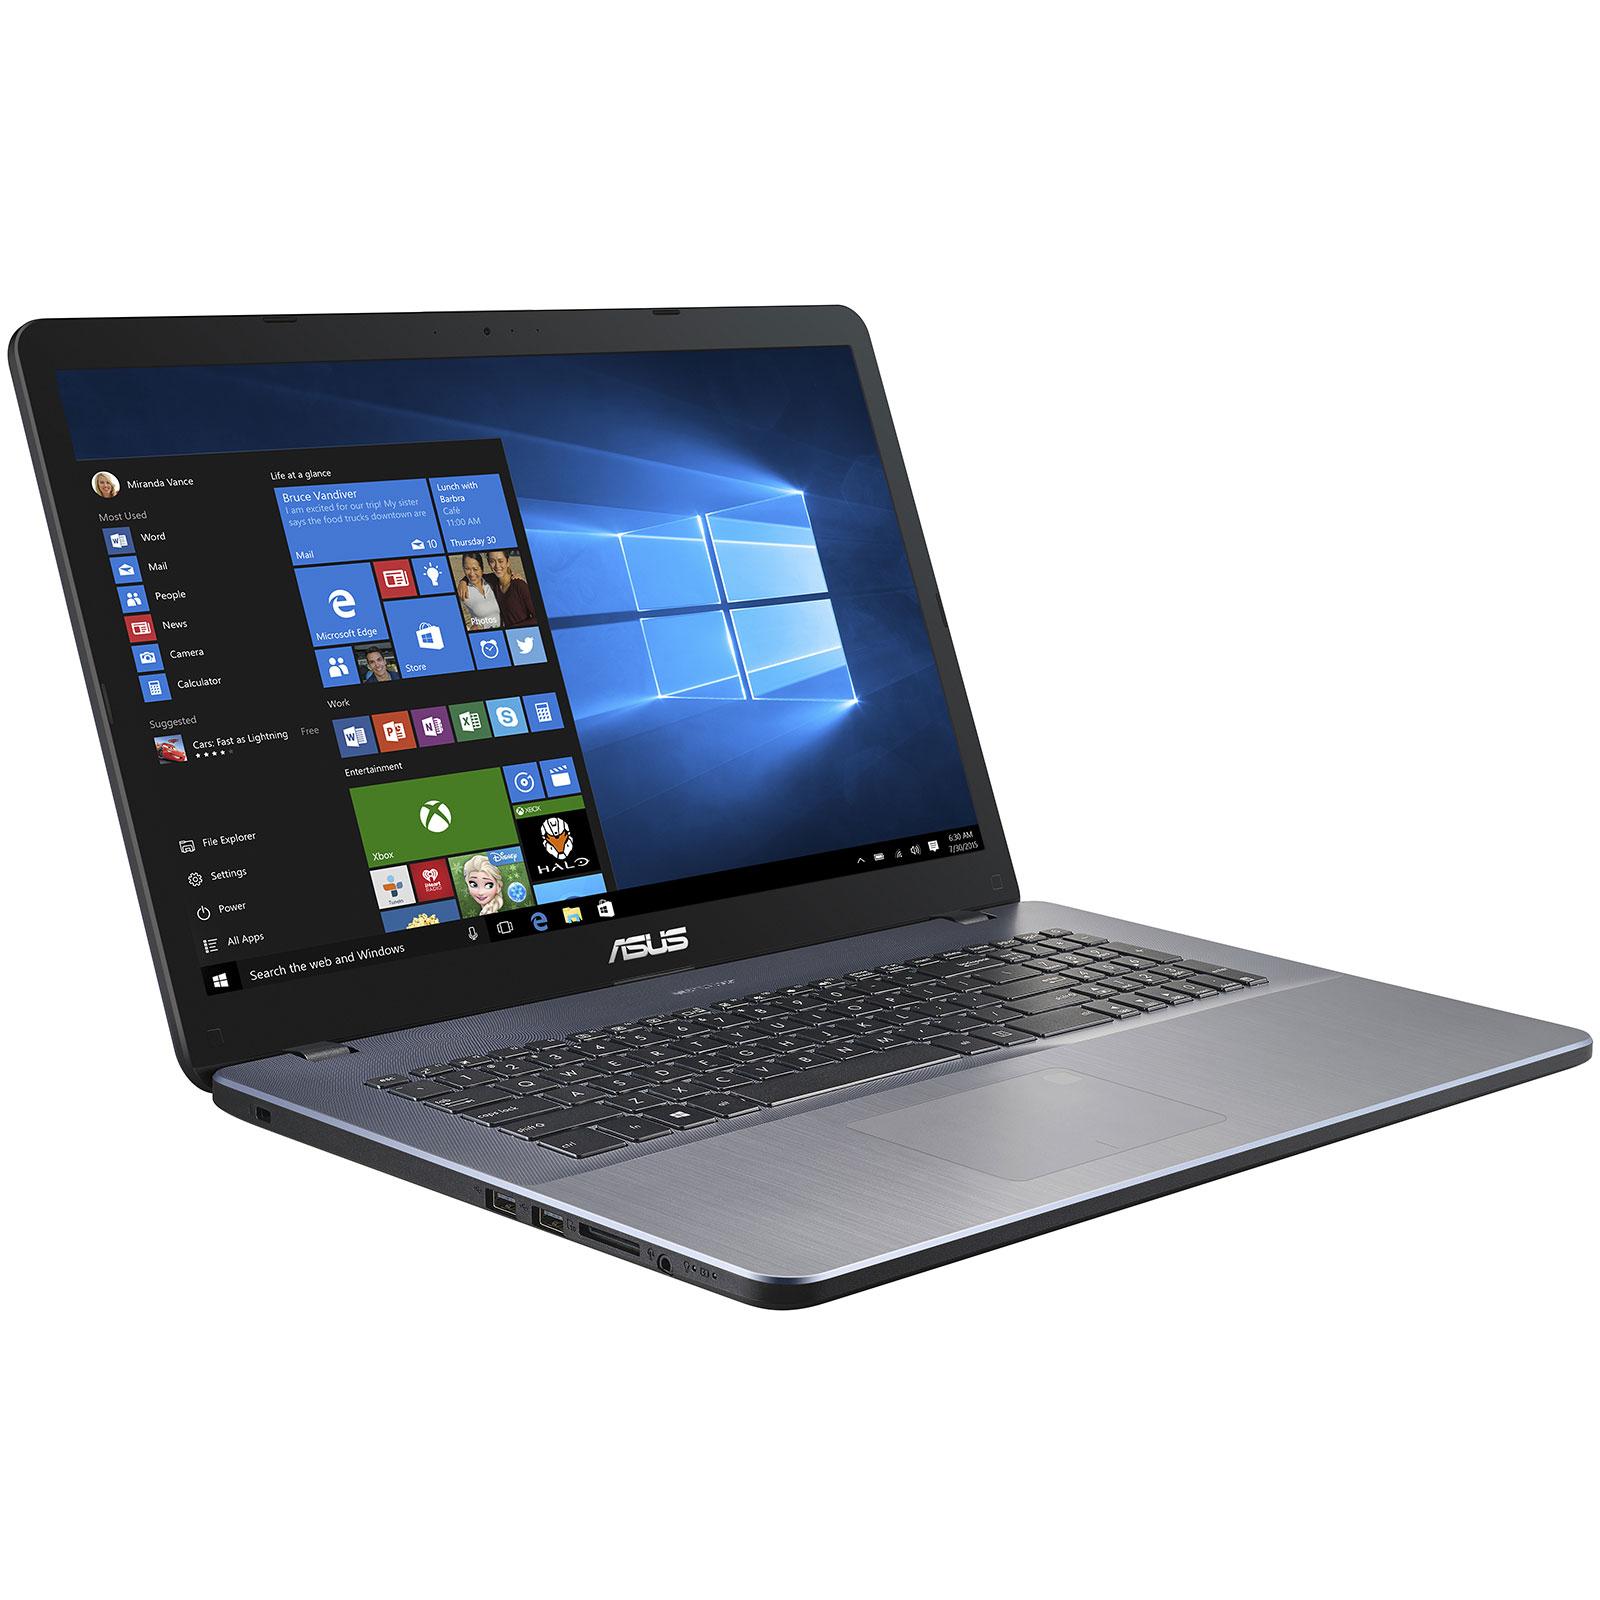 "PC portable ASUS R702UA-BX552T Intel Core i3-8130U 4 Go SSD 128 Go + HDD 1 To 17.3"" LED HD+ Wi-Fi N/Bluetooth Webcam Windows 10 Famille 64 bits (garantie constructeur 2 ans)"